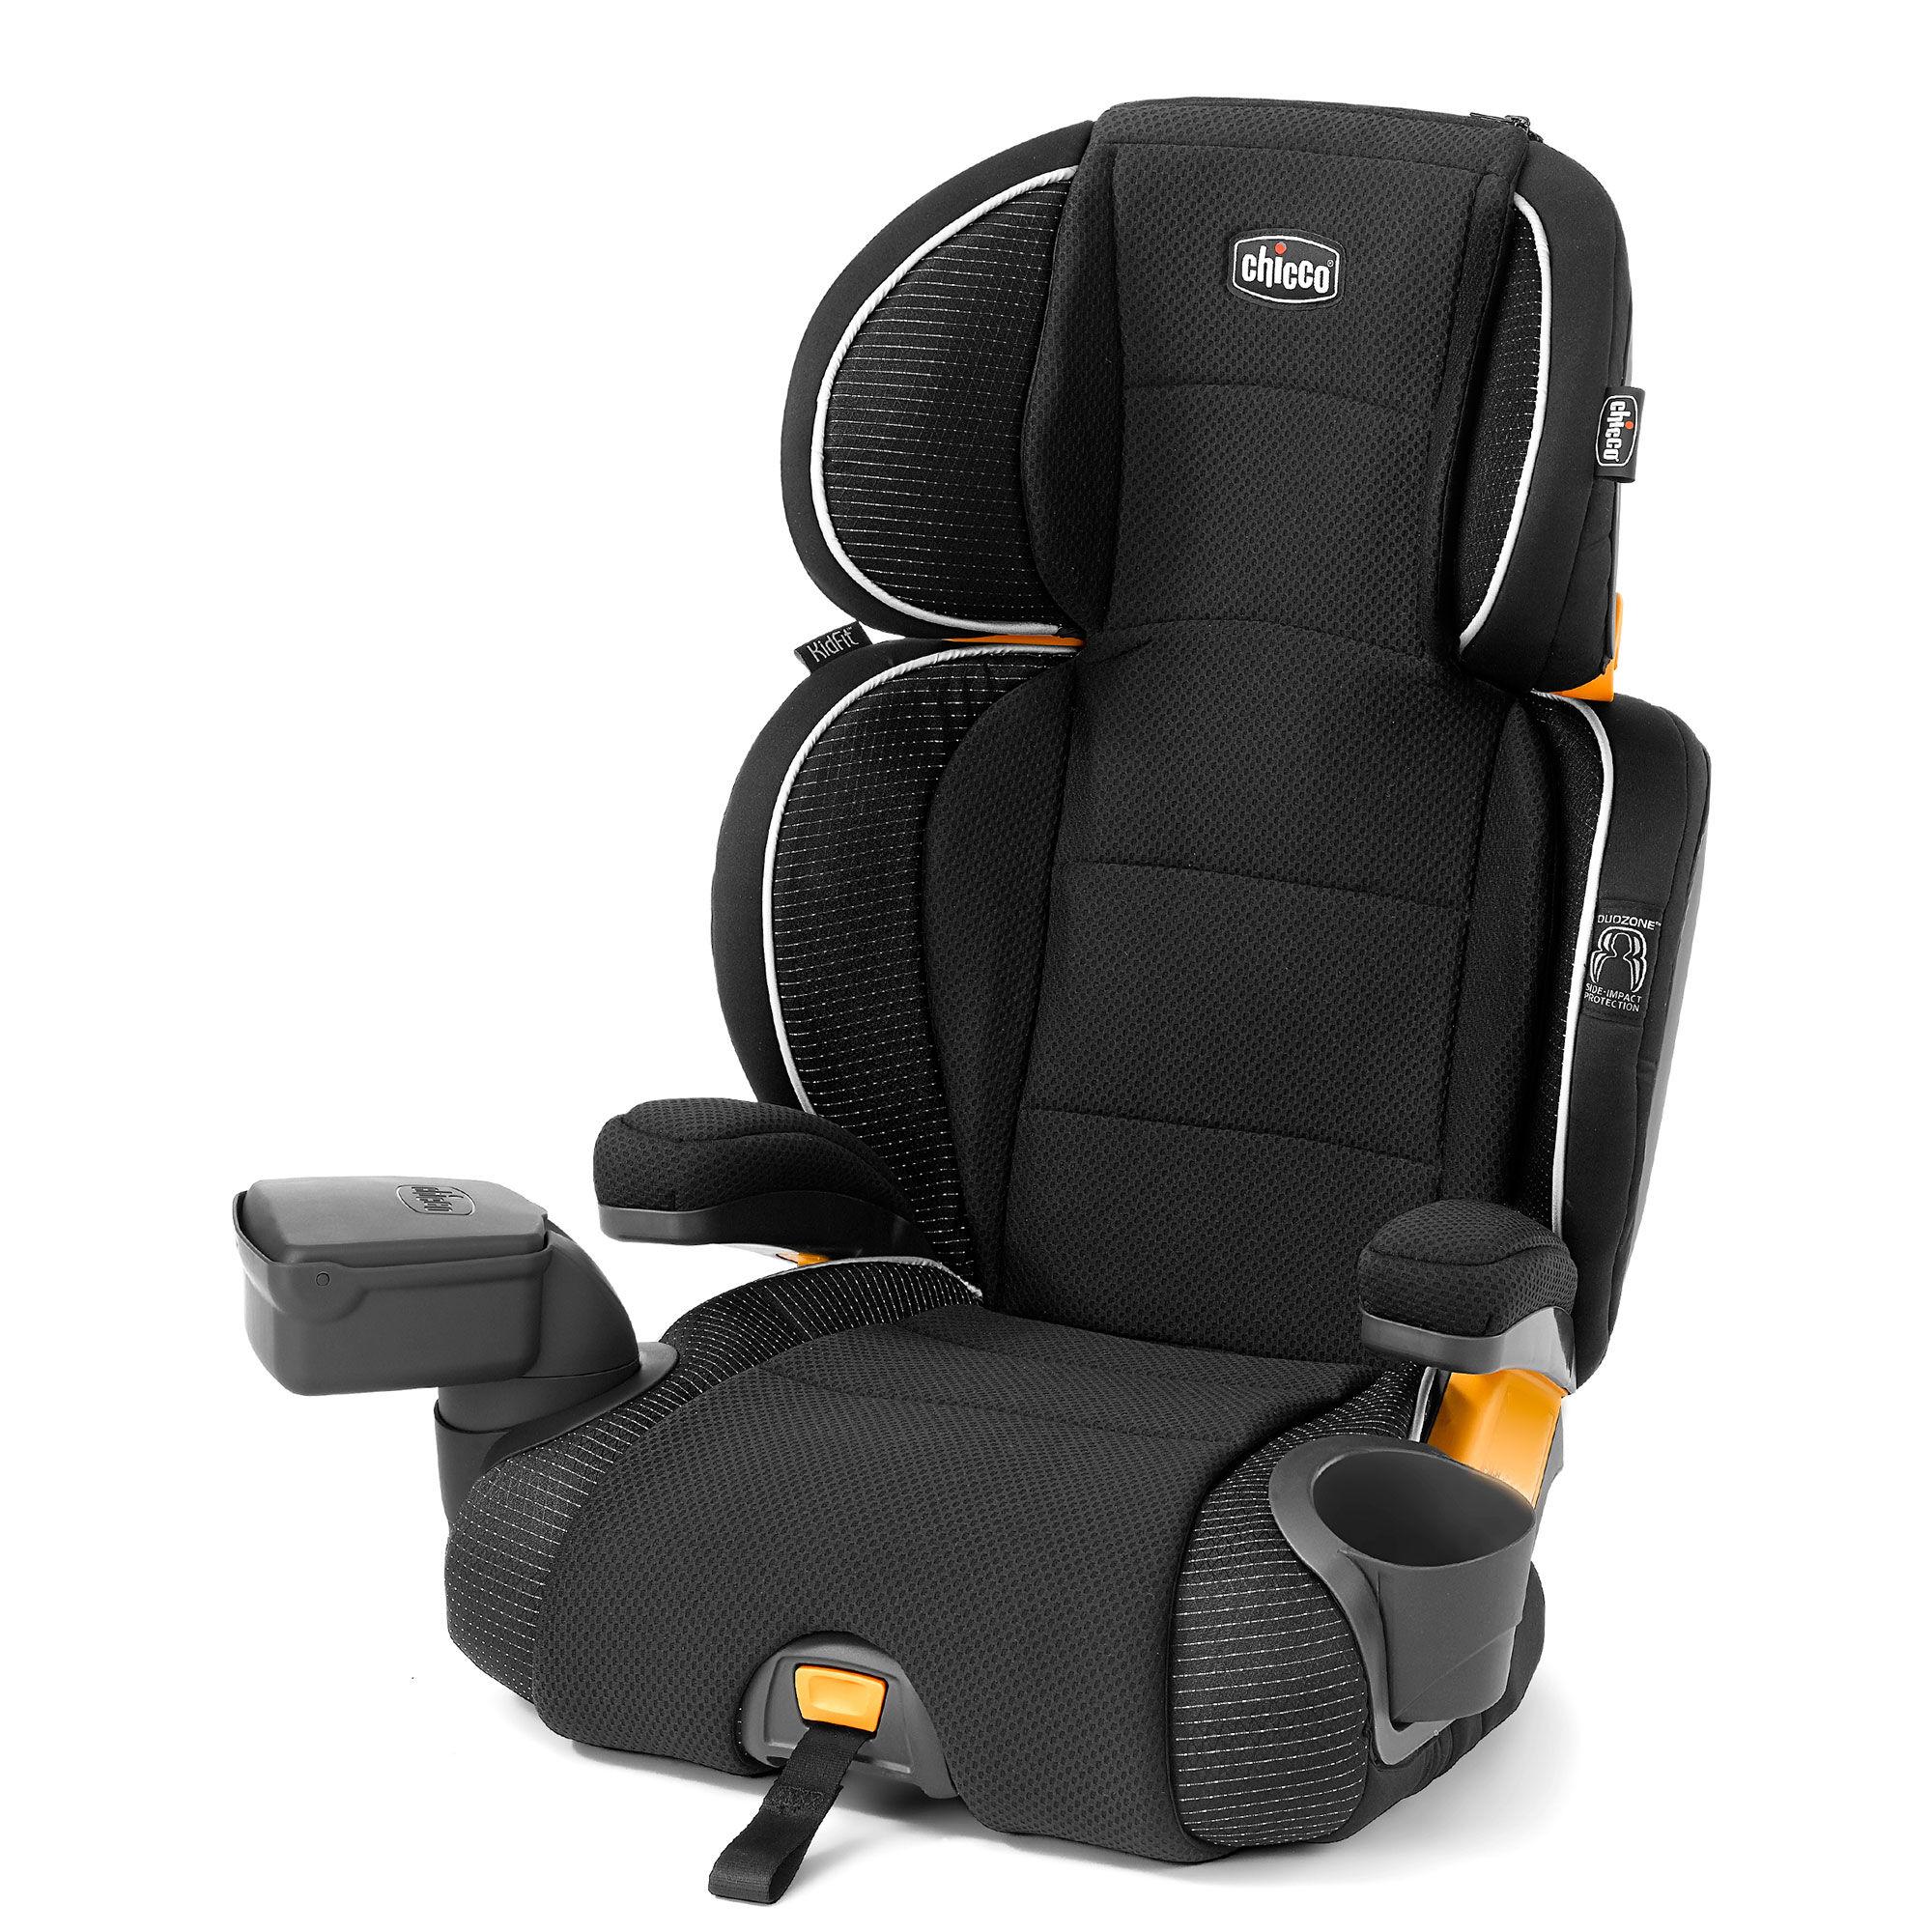 chicco kidfit zip 2 in 1 belt positioning booster car seat genesis. Black Bedroom Furniture Sets. Home Design Ideas